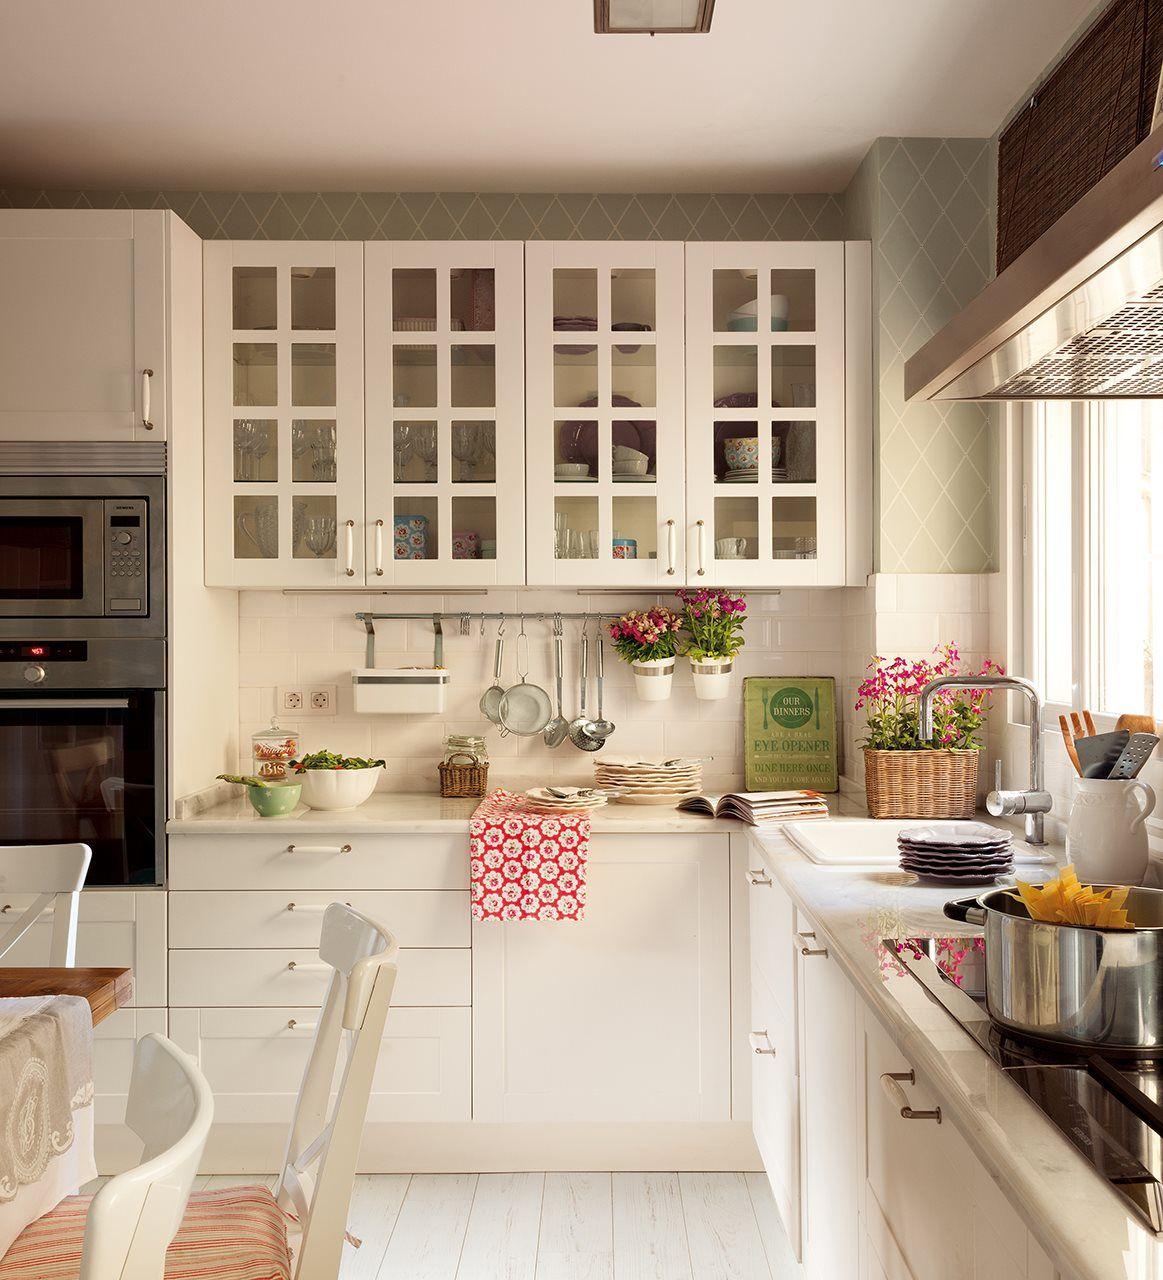 M s de 25 ideas incre bles sobre cocinas en blanco en for Las cocinas mas modernas